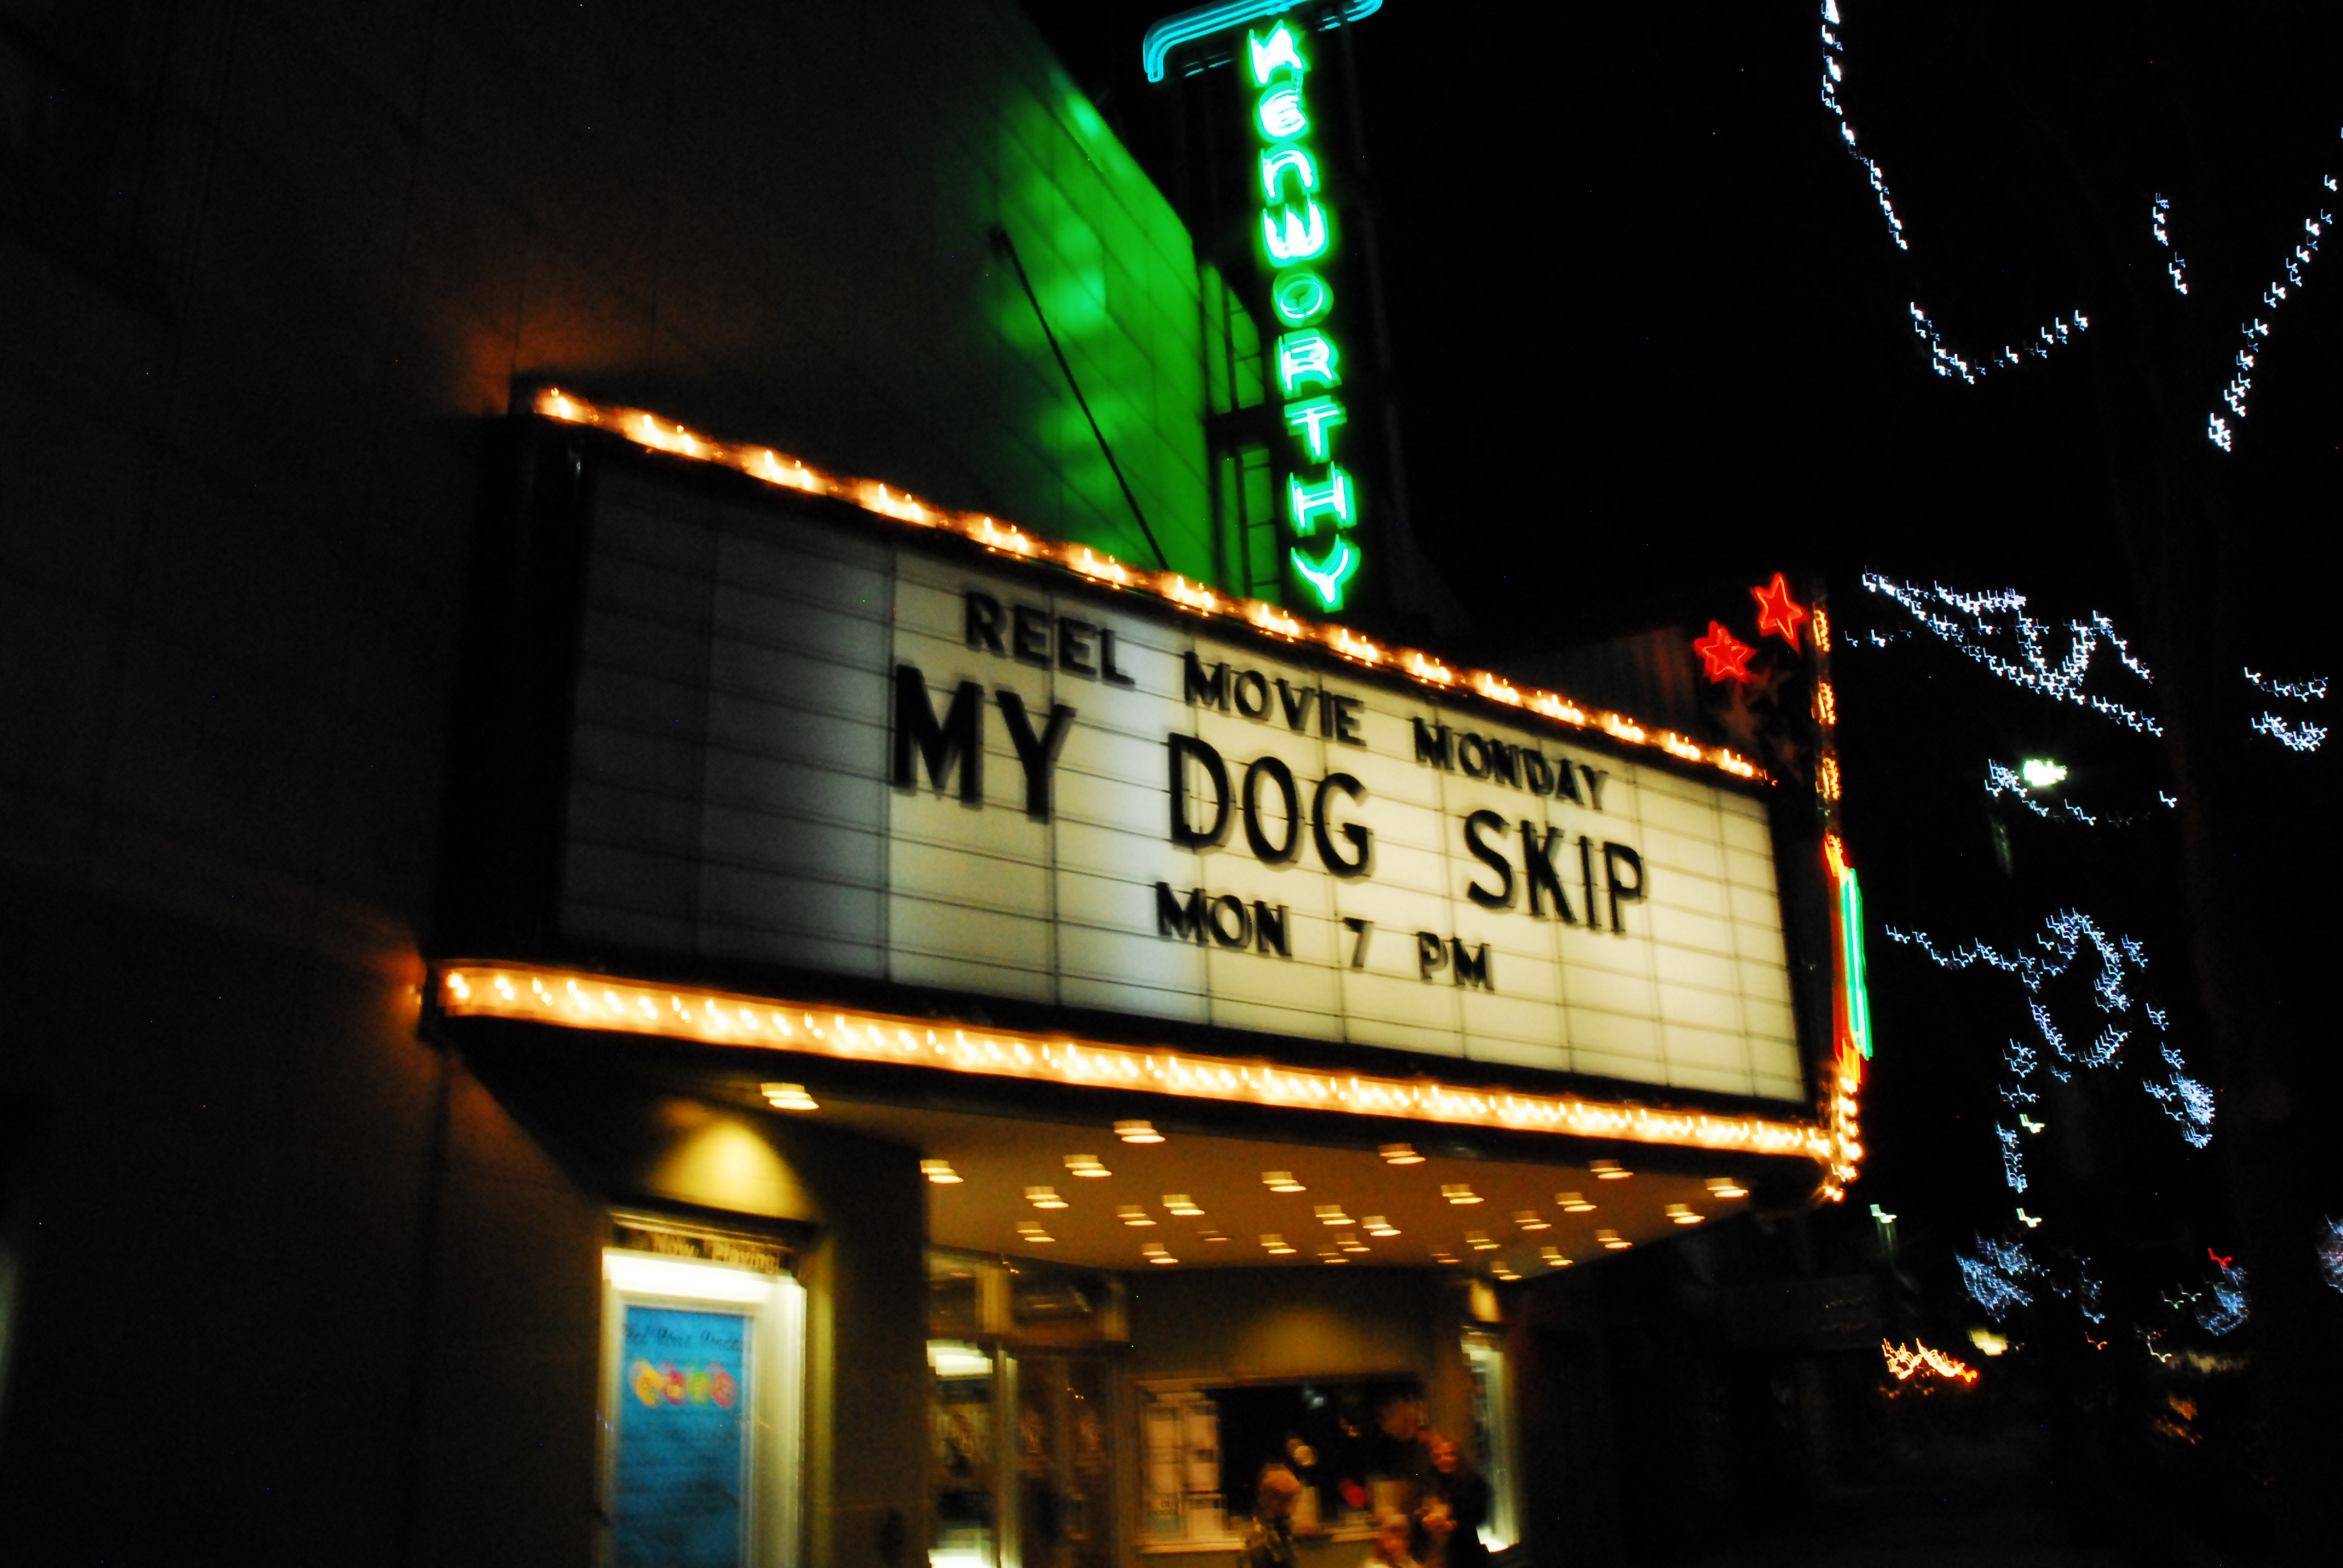 kenworthy-dog-movie